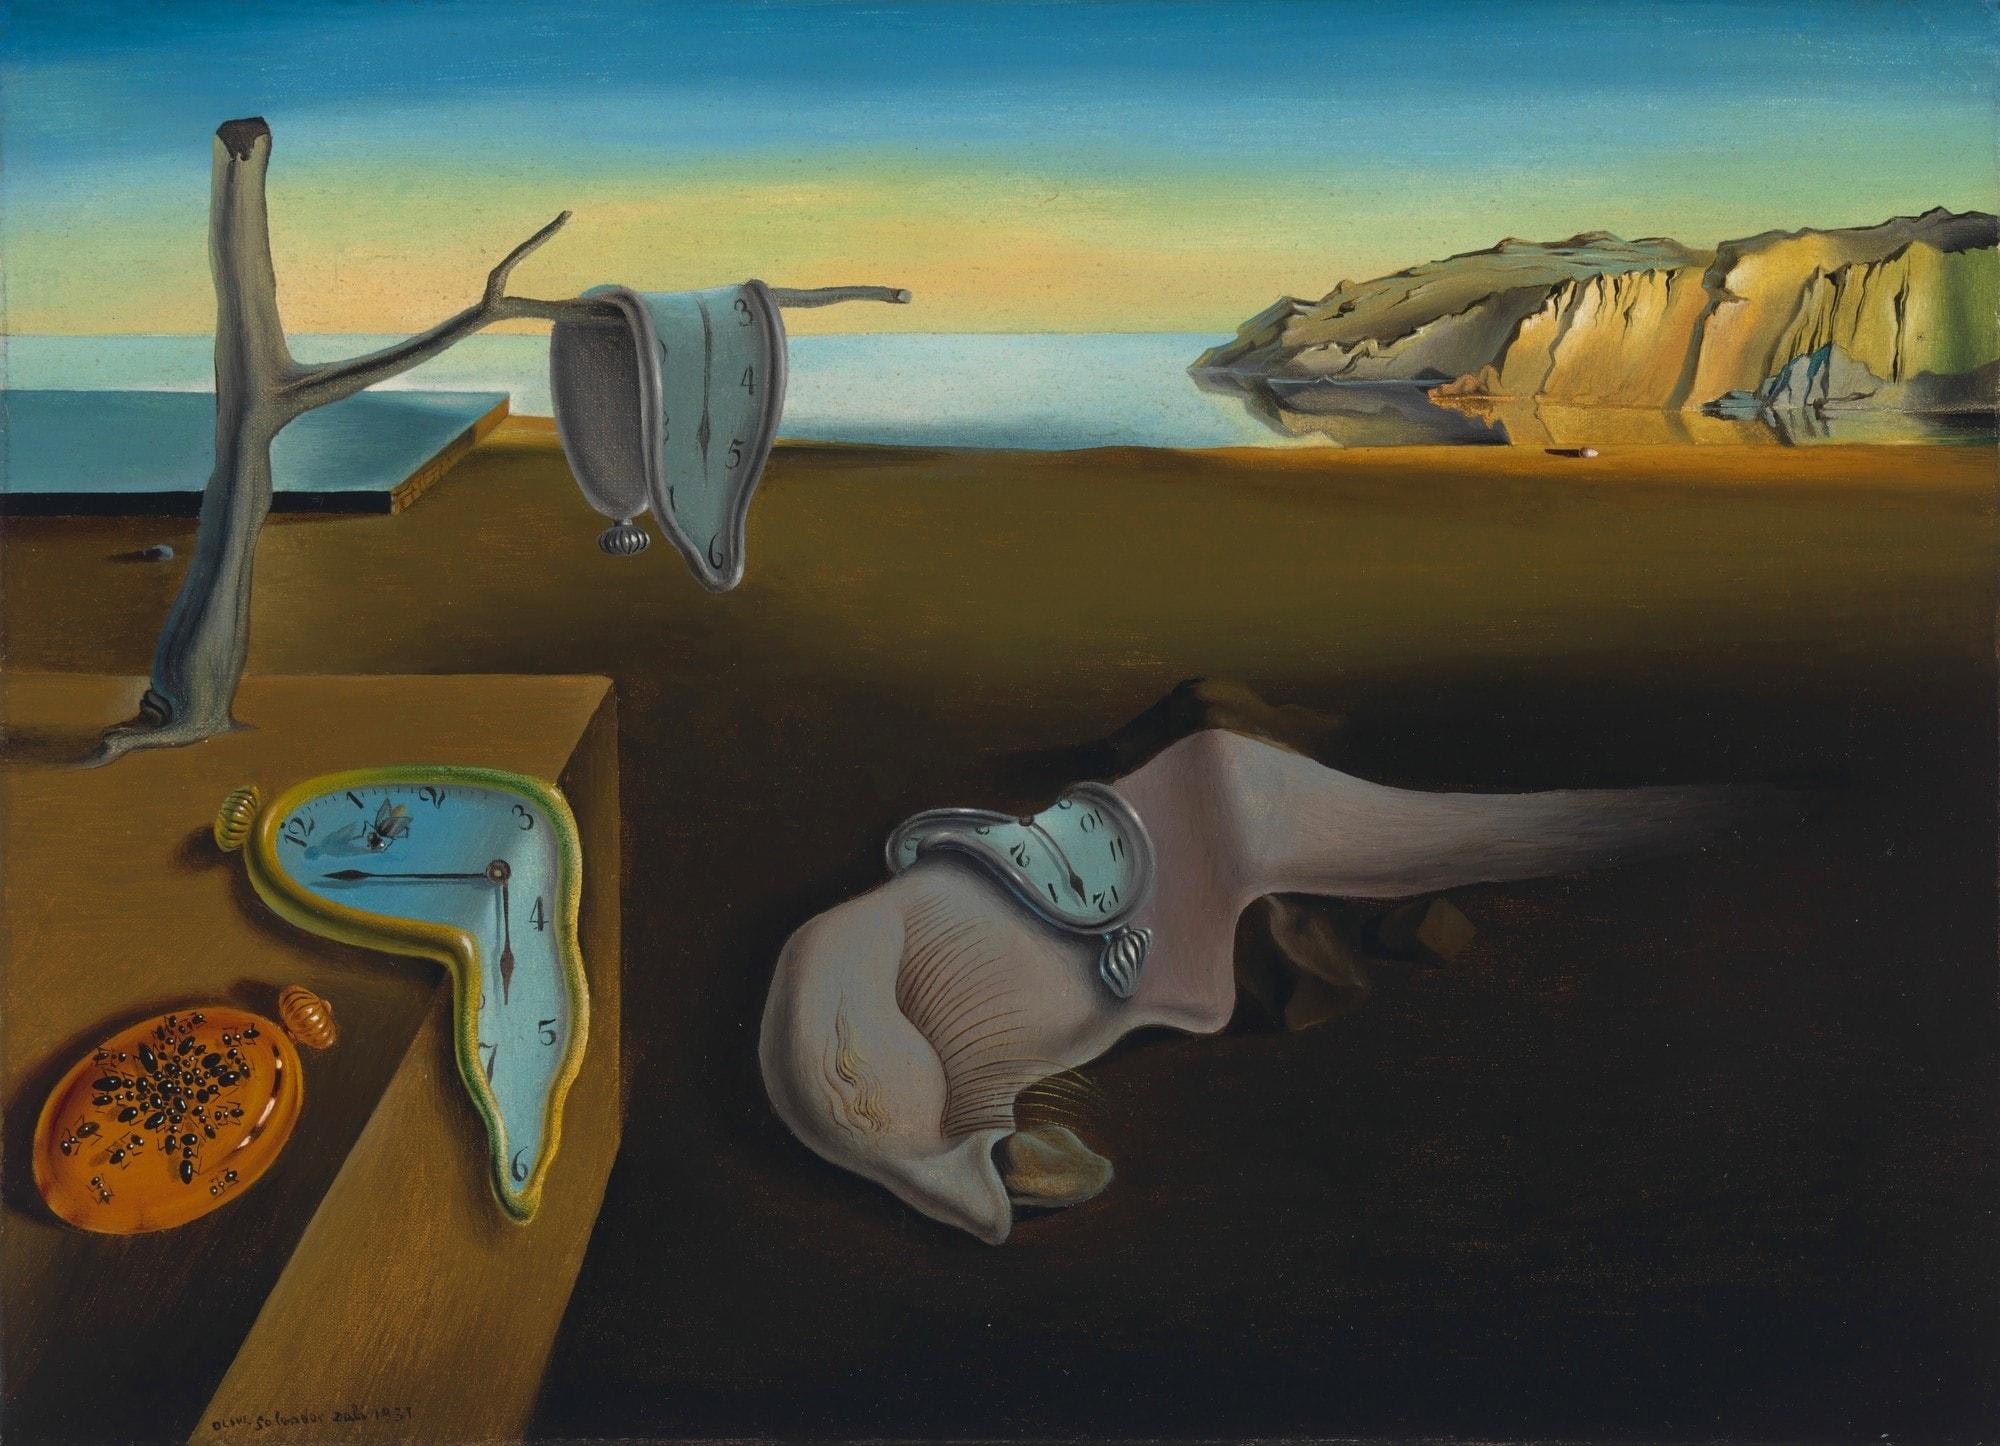 Постоянство памяти картина Сальвадора Дали. (часы, время течет, постоянство времени, картина с часами).